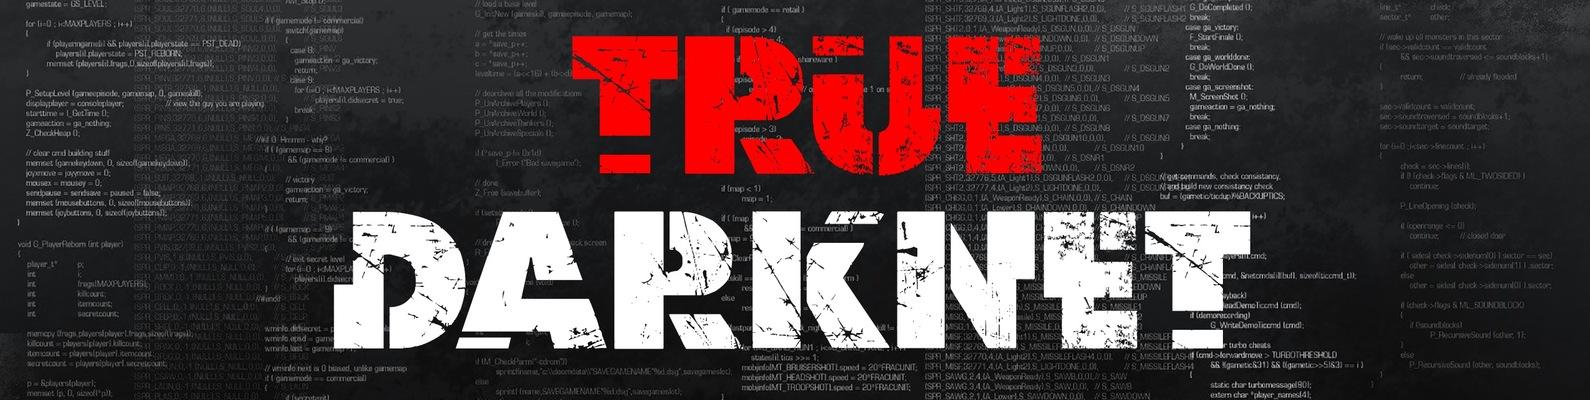 Даркнет сайт хакеров попасть на гидру darknet onion url